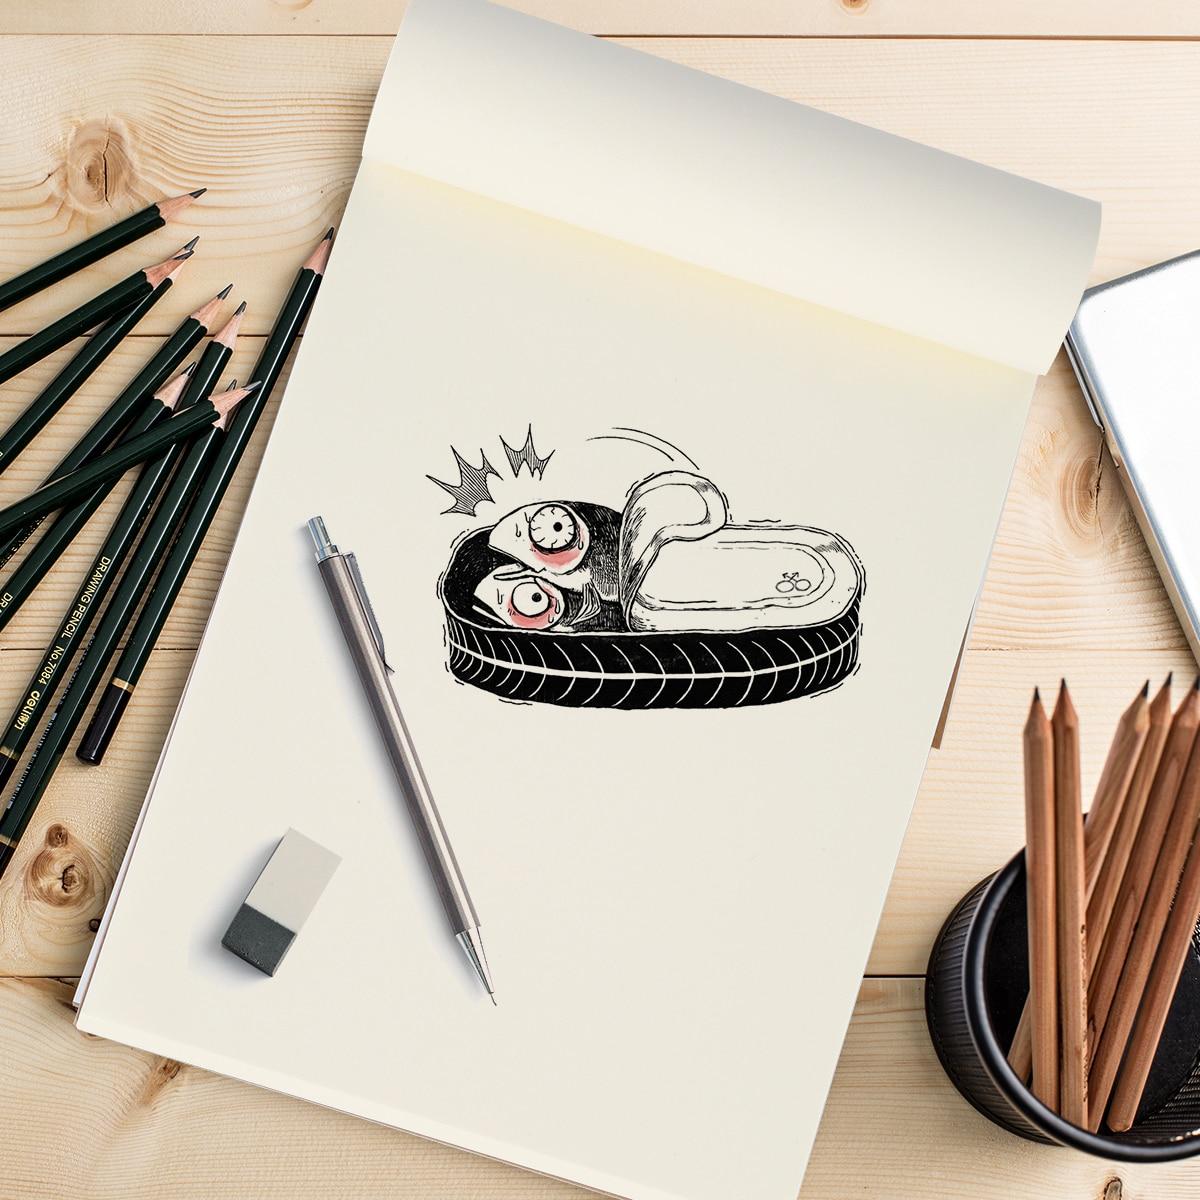 Blank Flipbook 1pc 80 Sheets Blank Flipbooks Drawing Sketchbook Kraft Cover Drawing Sketchbooks For Animation Cartoon Creation